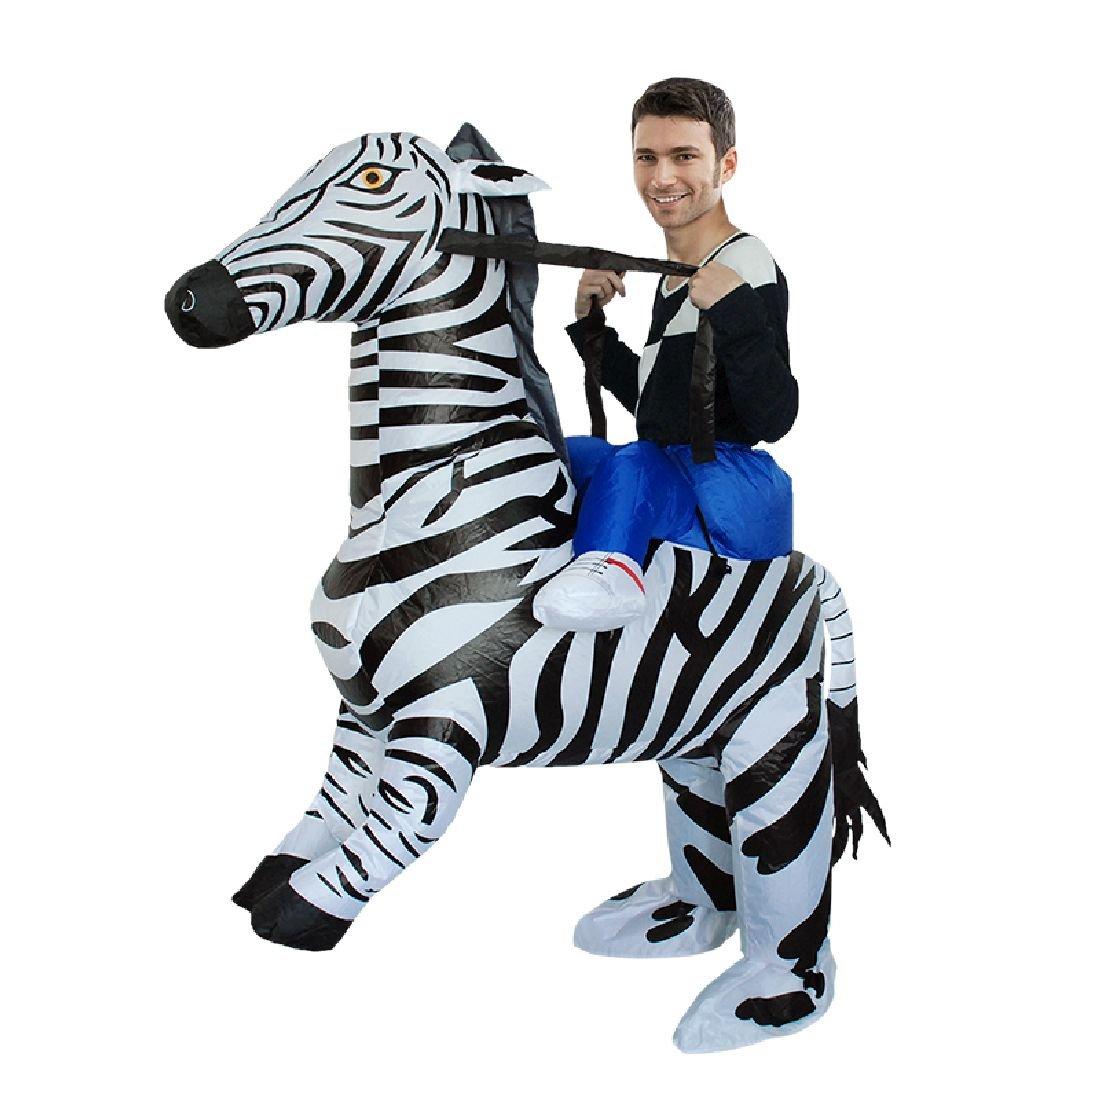 Halloween Inflatable Costume Zebra Cosplay Party Dress Up